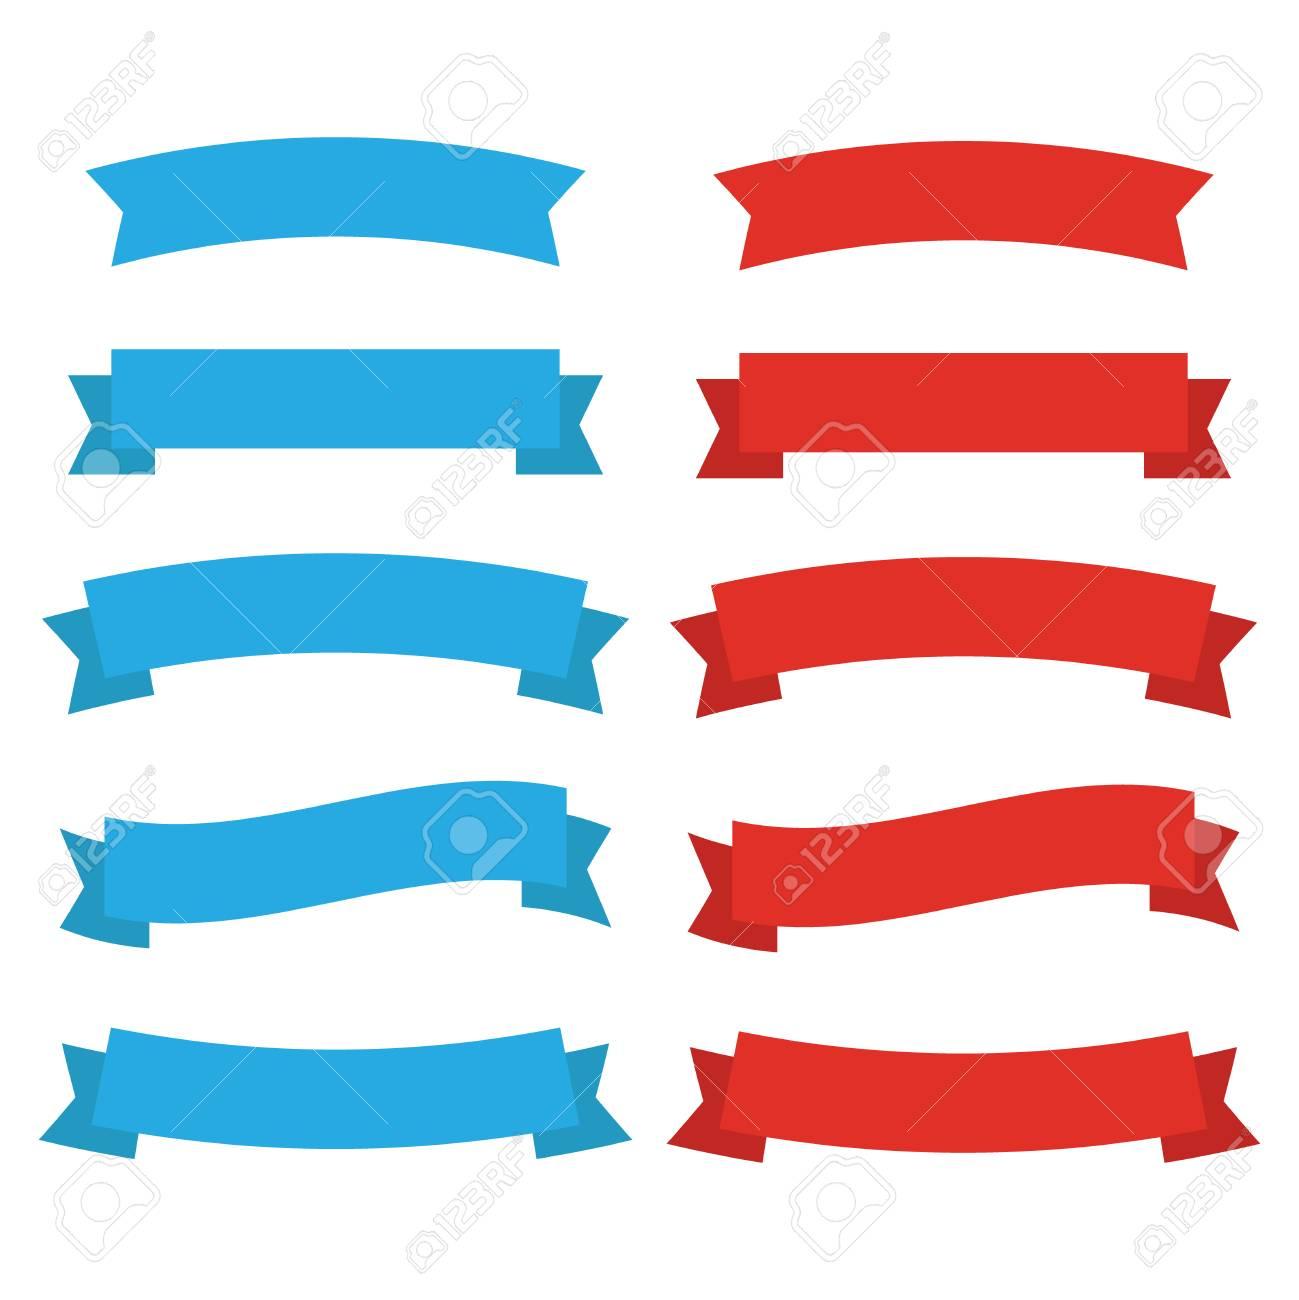 ribbons banners decor vector flat ribbons icon royalty free rh 123rf com vector ribbon banner eps vector ribbon banner corel draw 2017